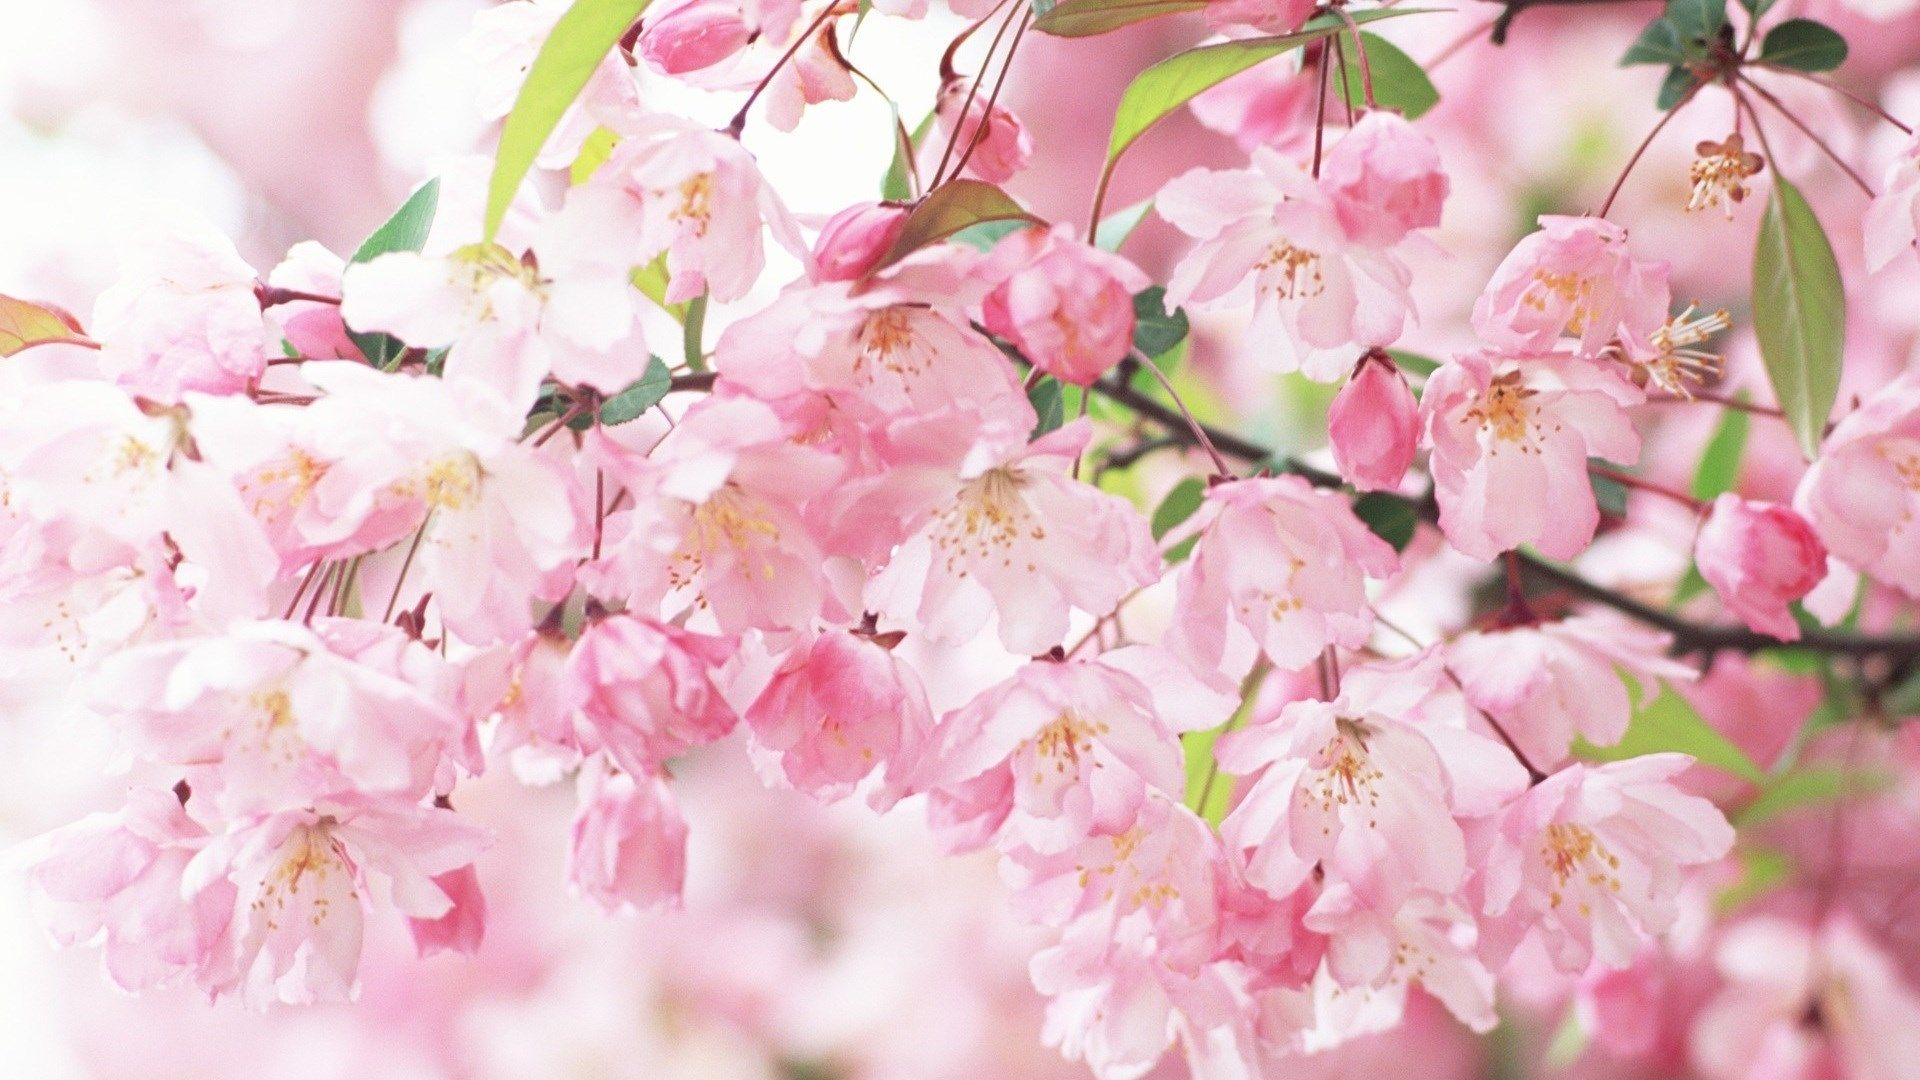 Spring Entdeckung Nein Kalender Hintergrundbilder: Cherry Blossom Wallpaper For Mac Computers